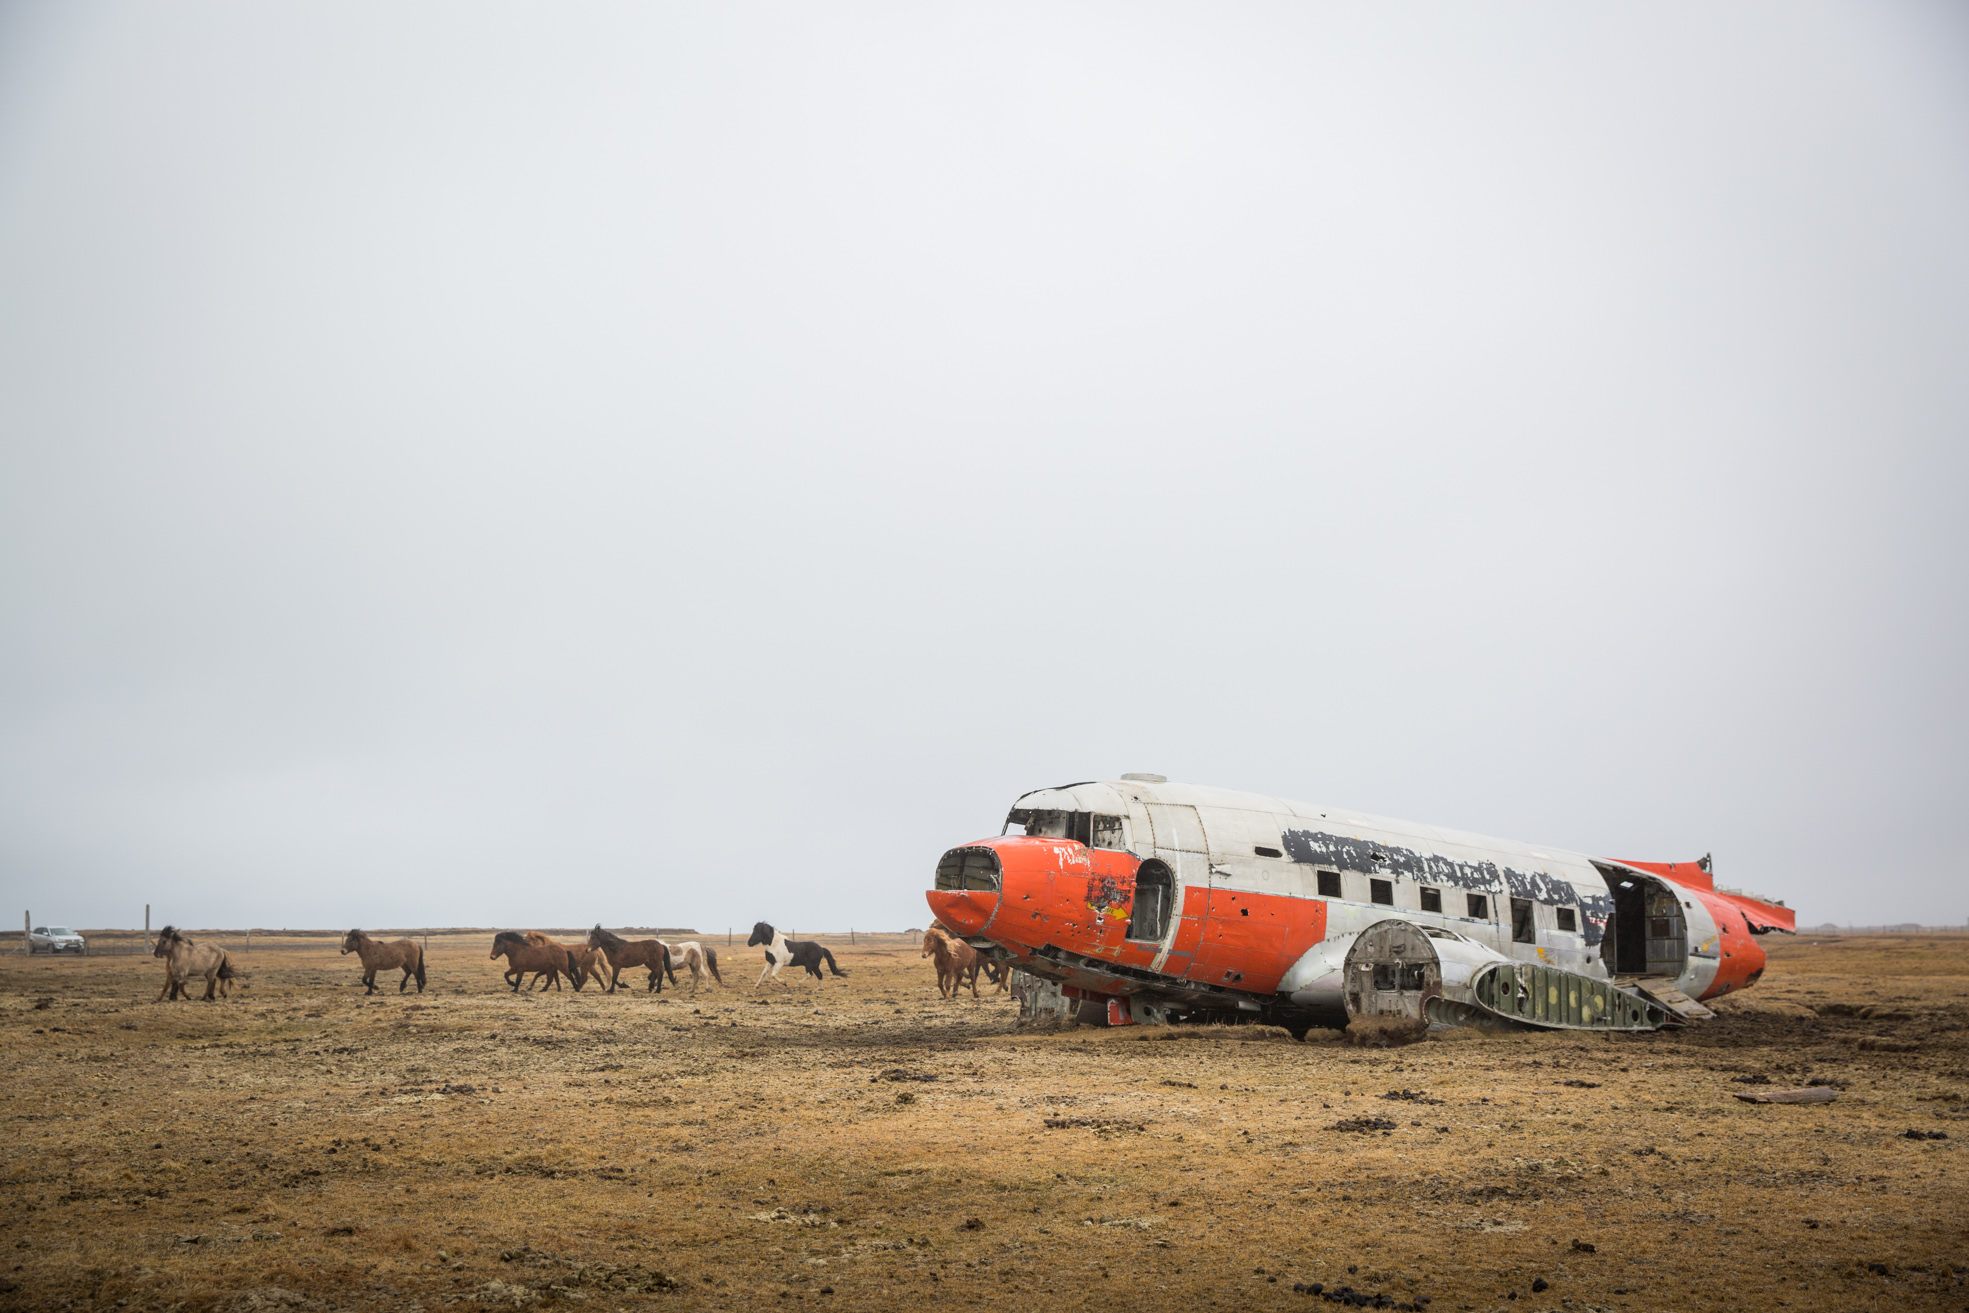 Avion abandonné islande, épave avion islande, avion plage islande, voyage islande, jean-Baptiste Chauvin photographe, www.studioart-photographe.fr